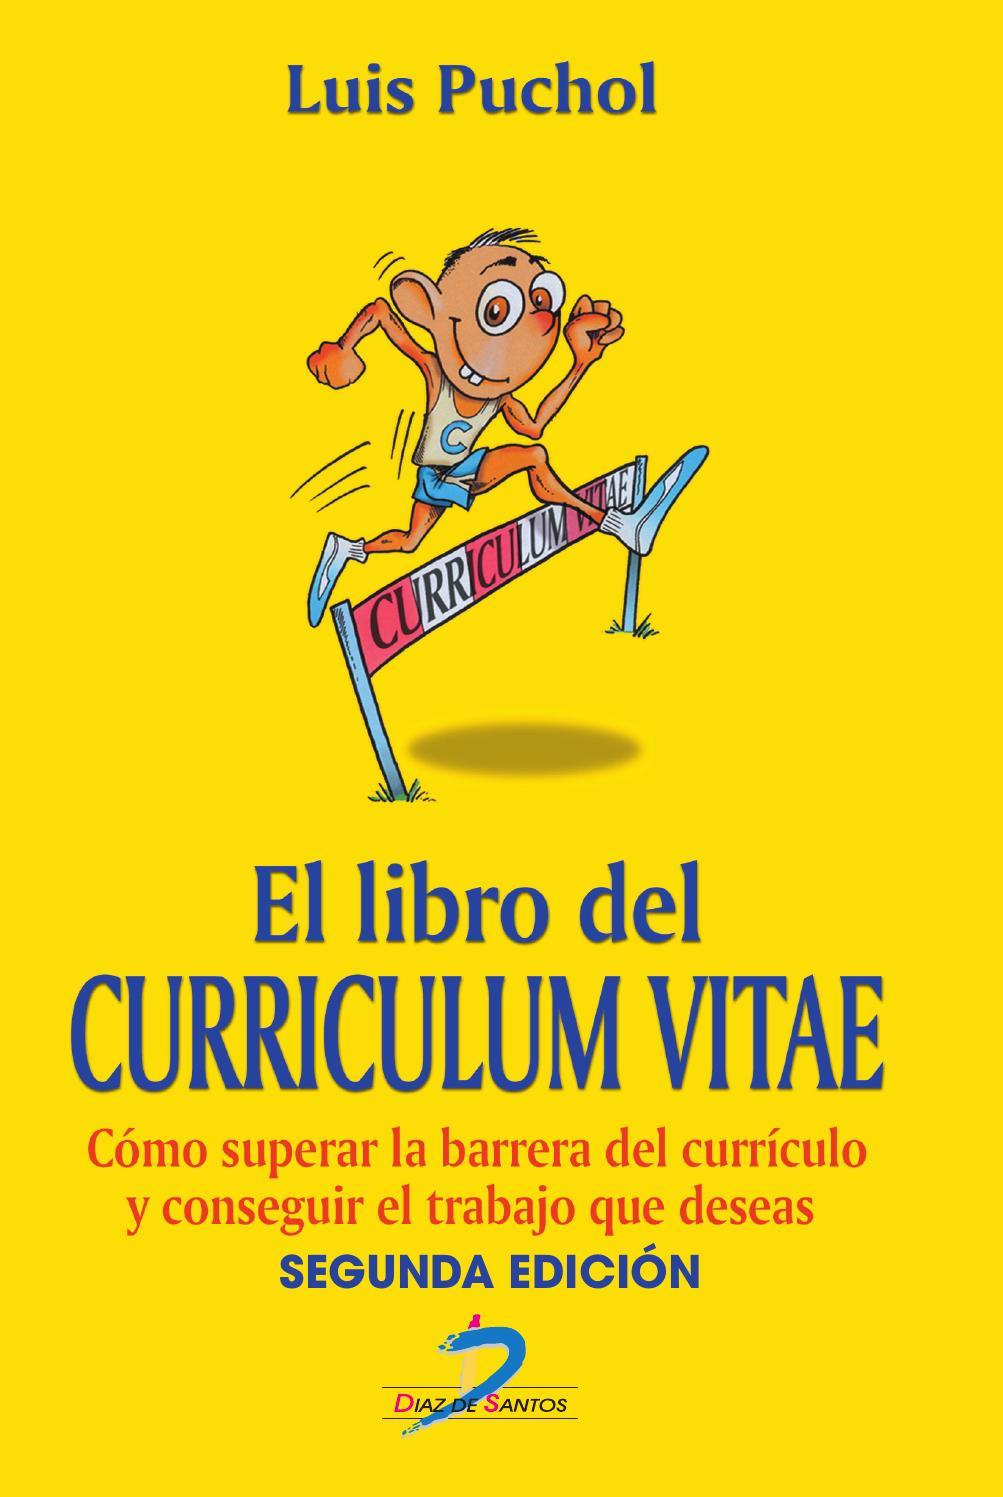 El libro del curriculum vitae by DoctorPC - issuu